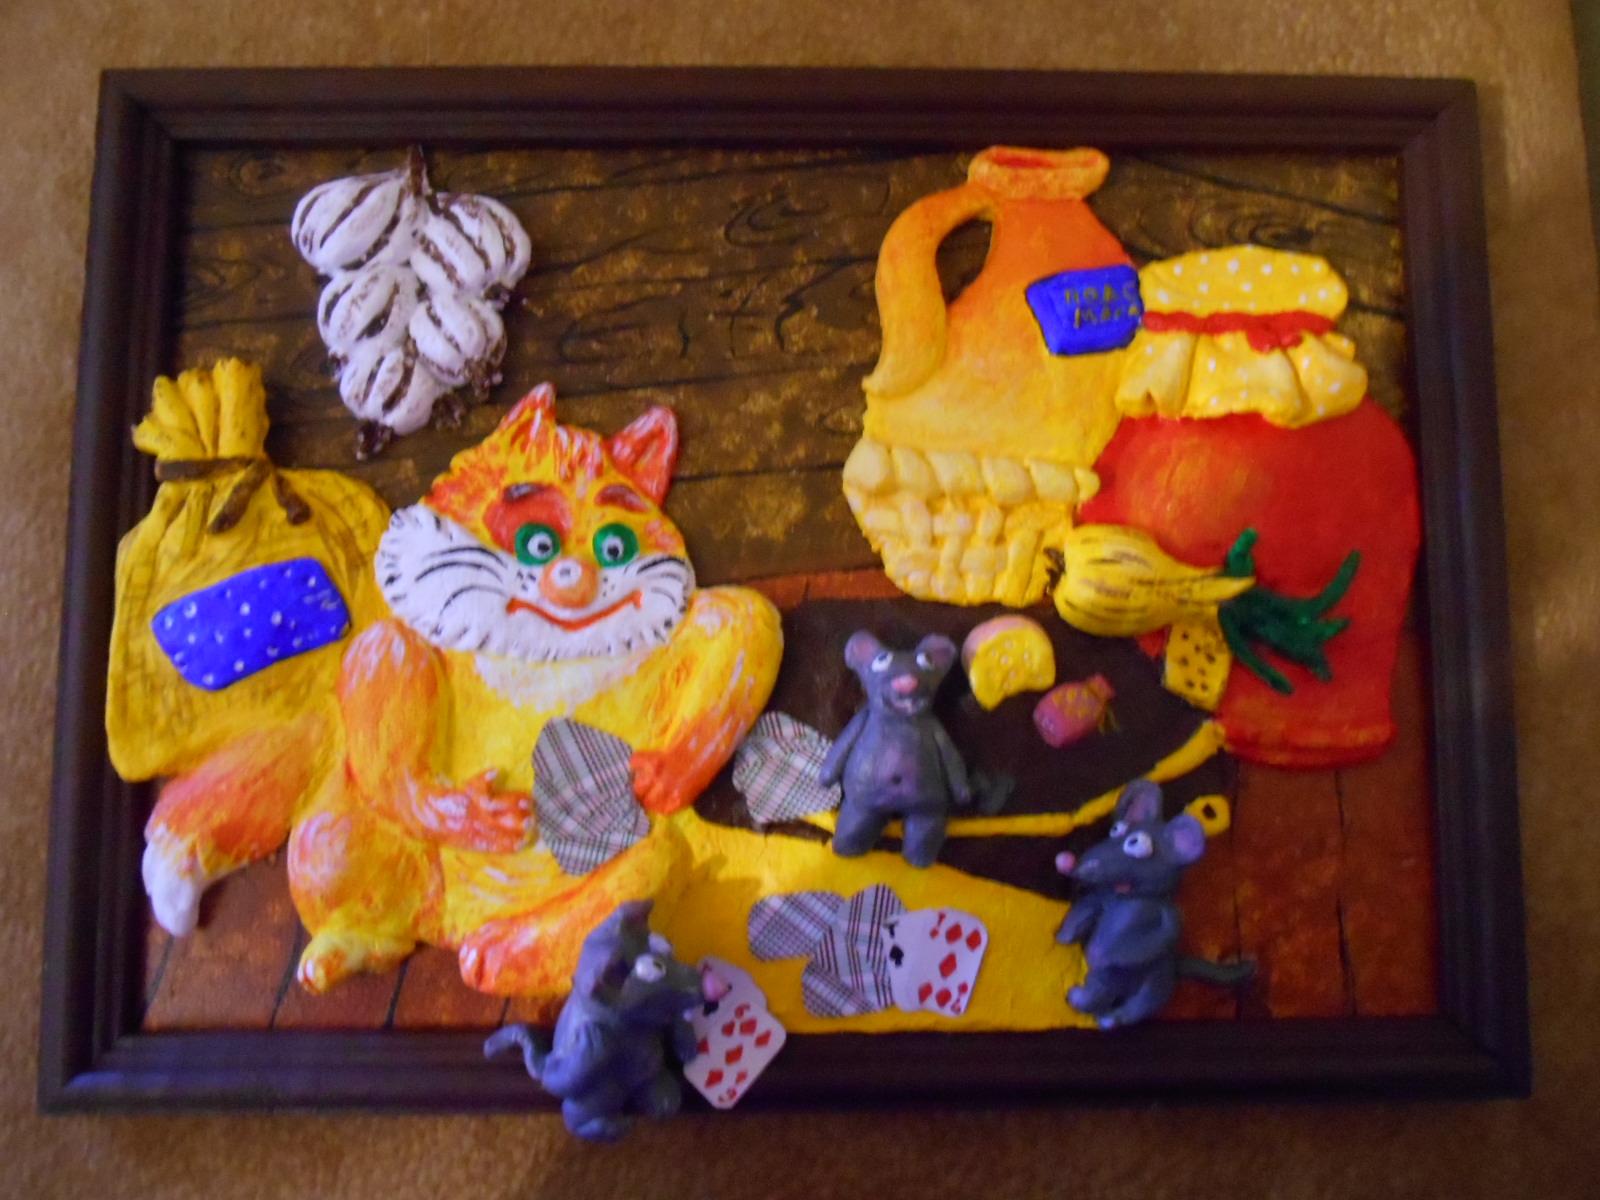 Композиция из биокерамики: Кот и мыши. Фото №2